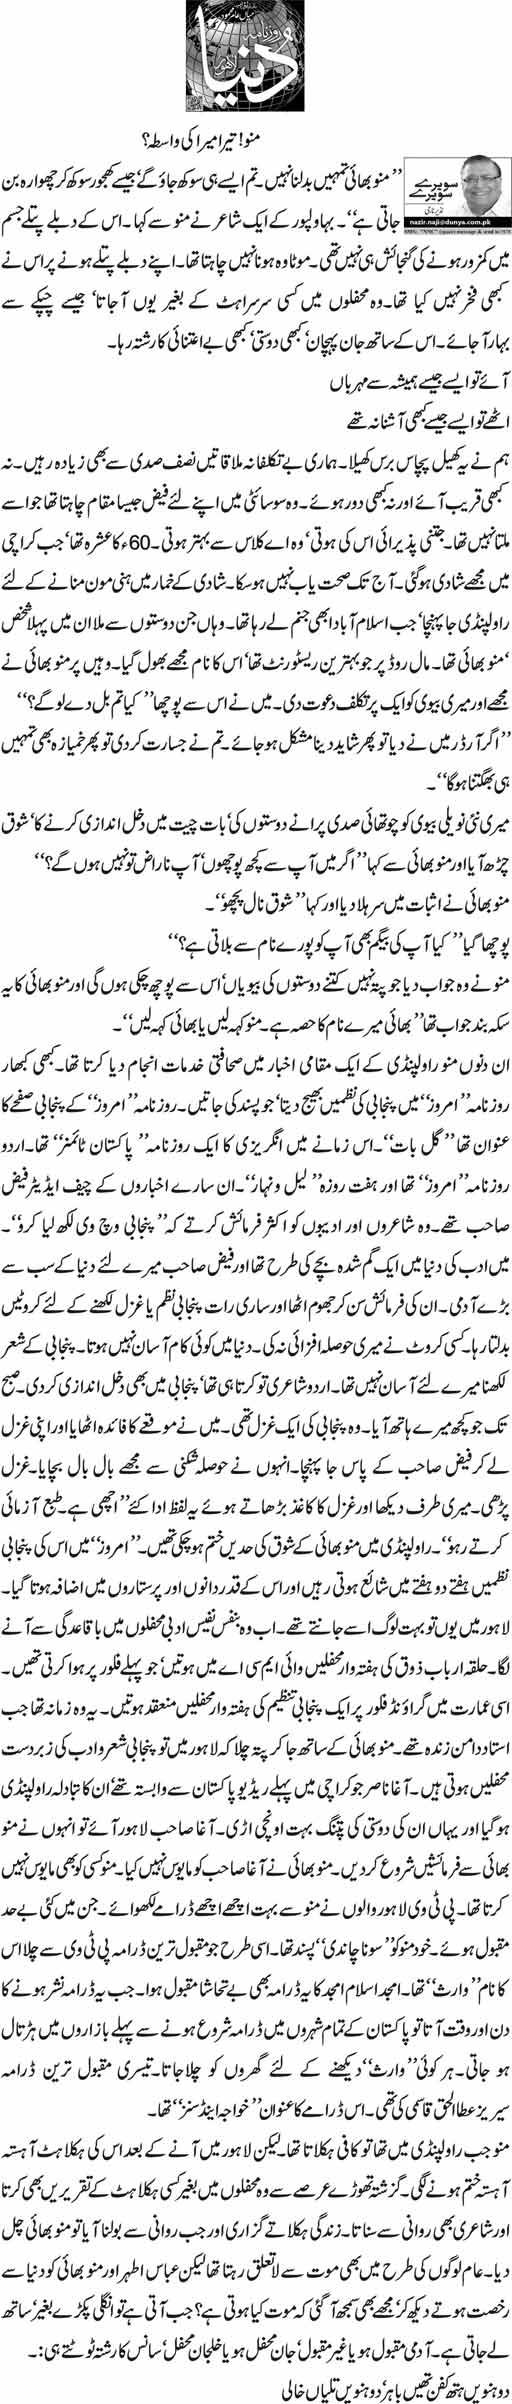 Munnu! Tera Mera Ki Wasta? | Nazir Naji | Daily Urdu Columns